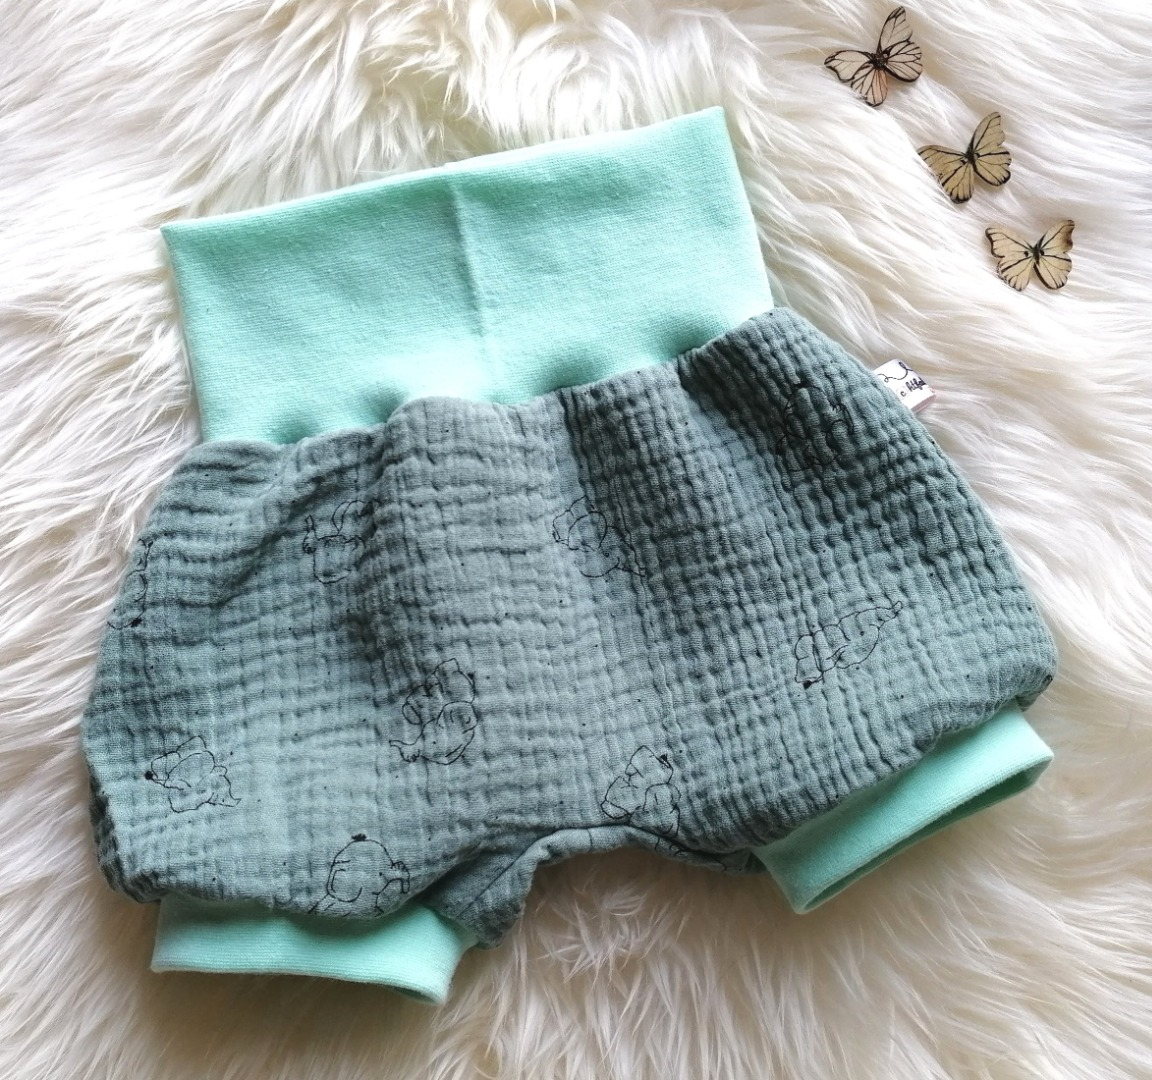 Baby Kind kurze Musselin Pumphose Shorts